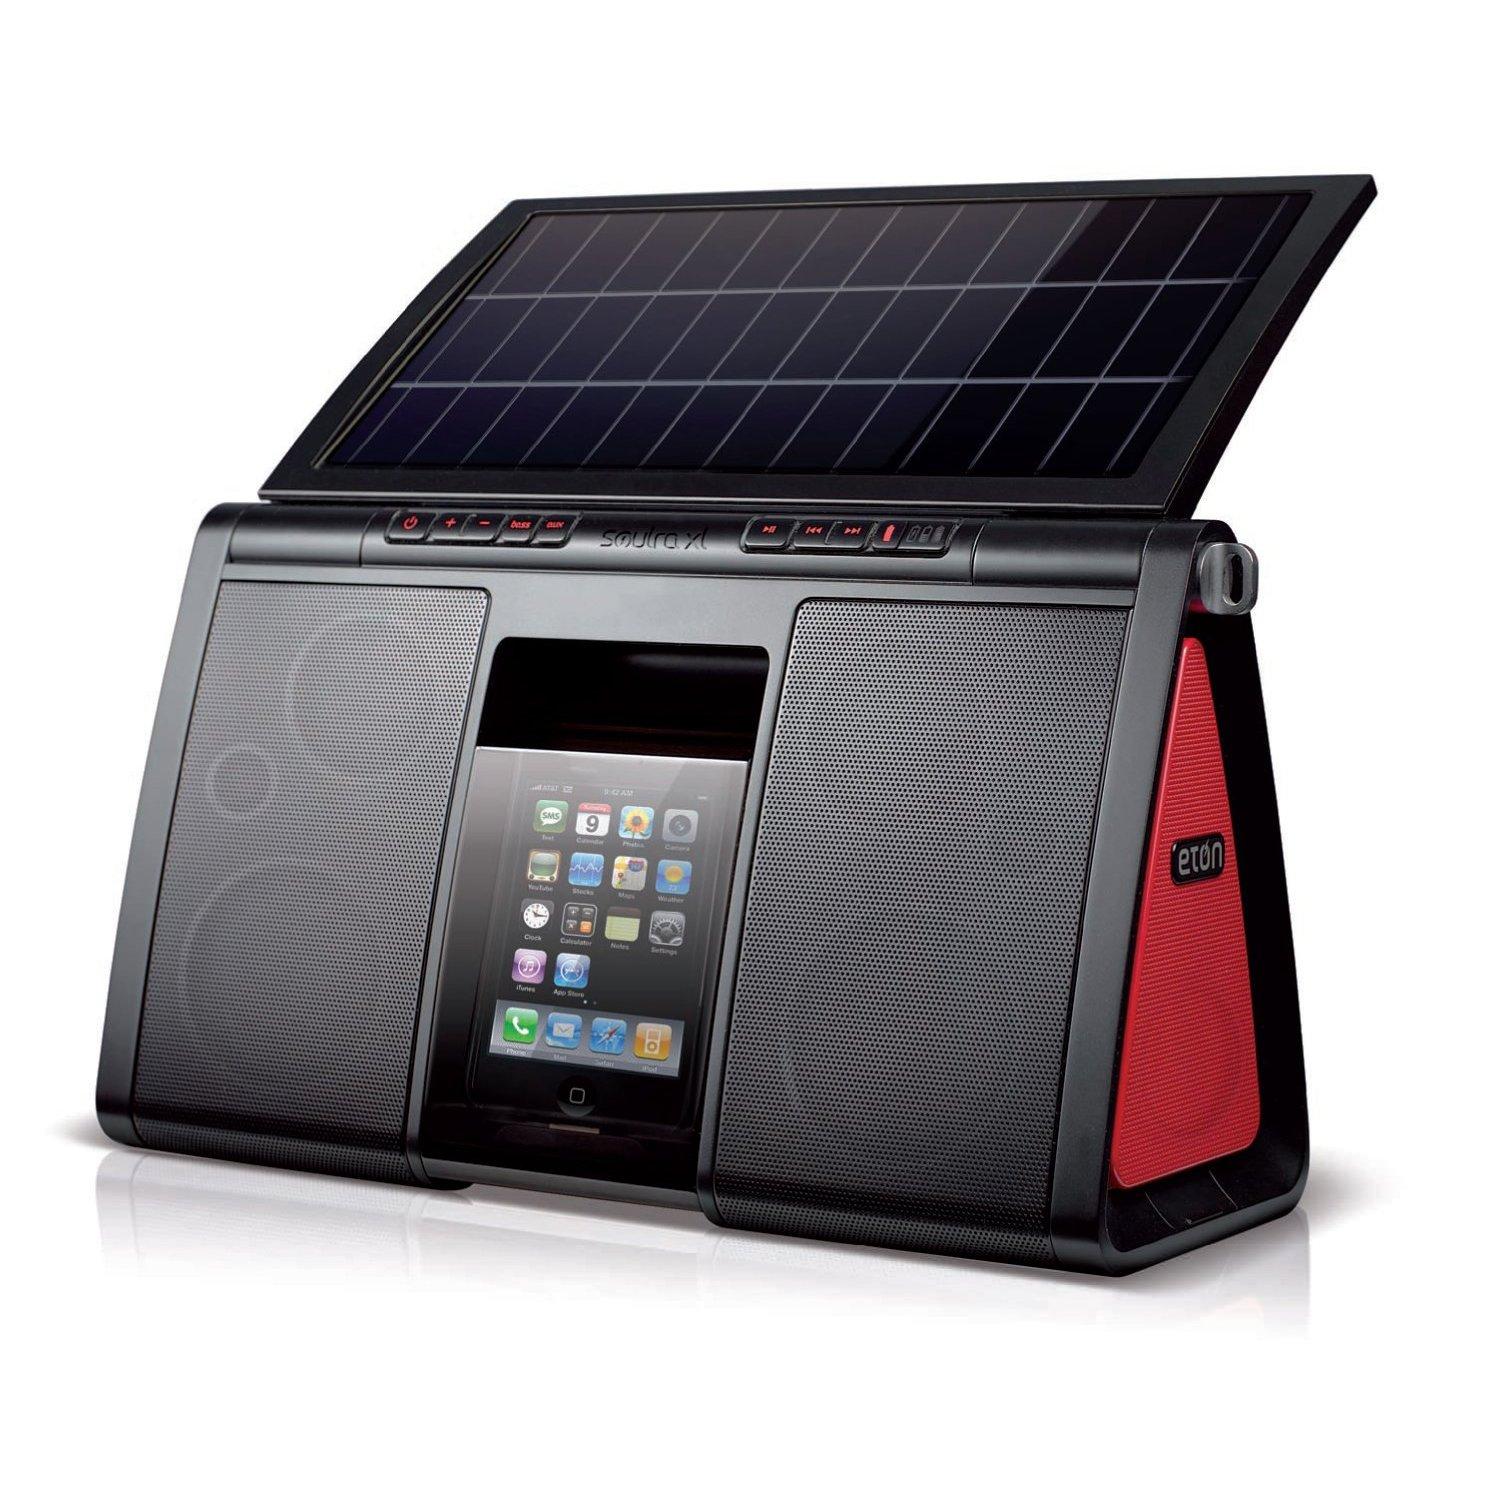 Top 5 Solar Powered Gadgets Crazycoolgadgets